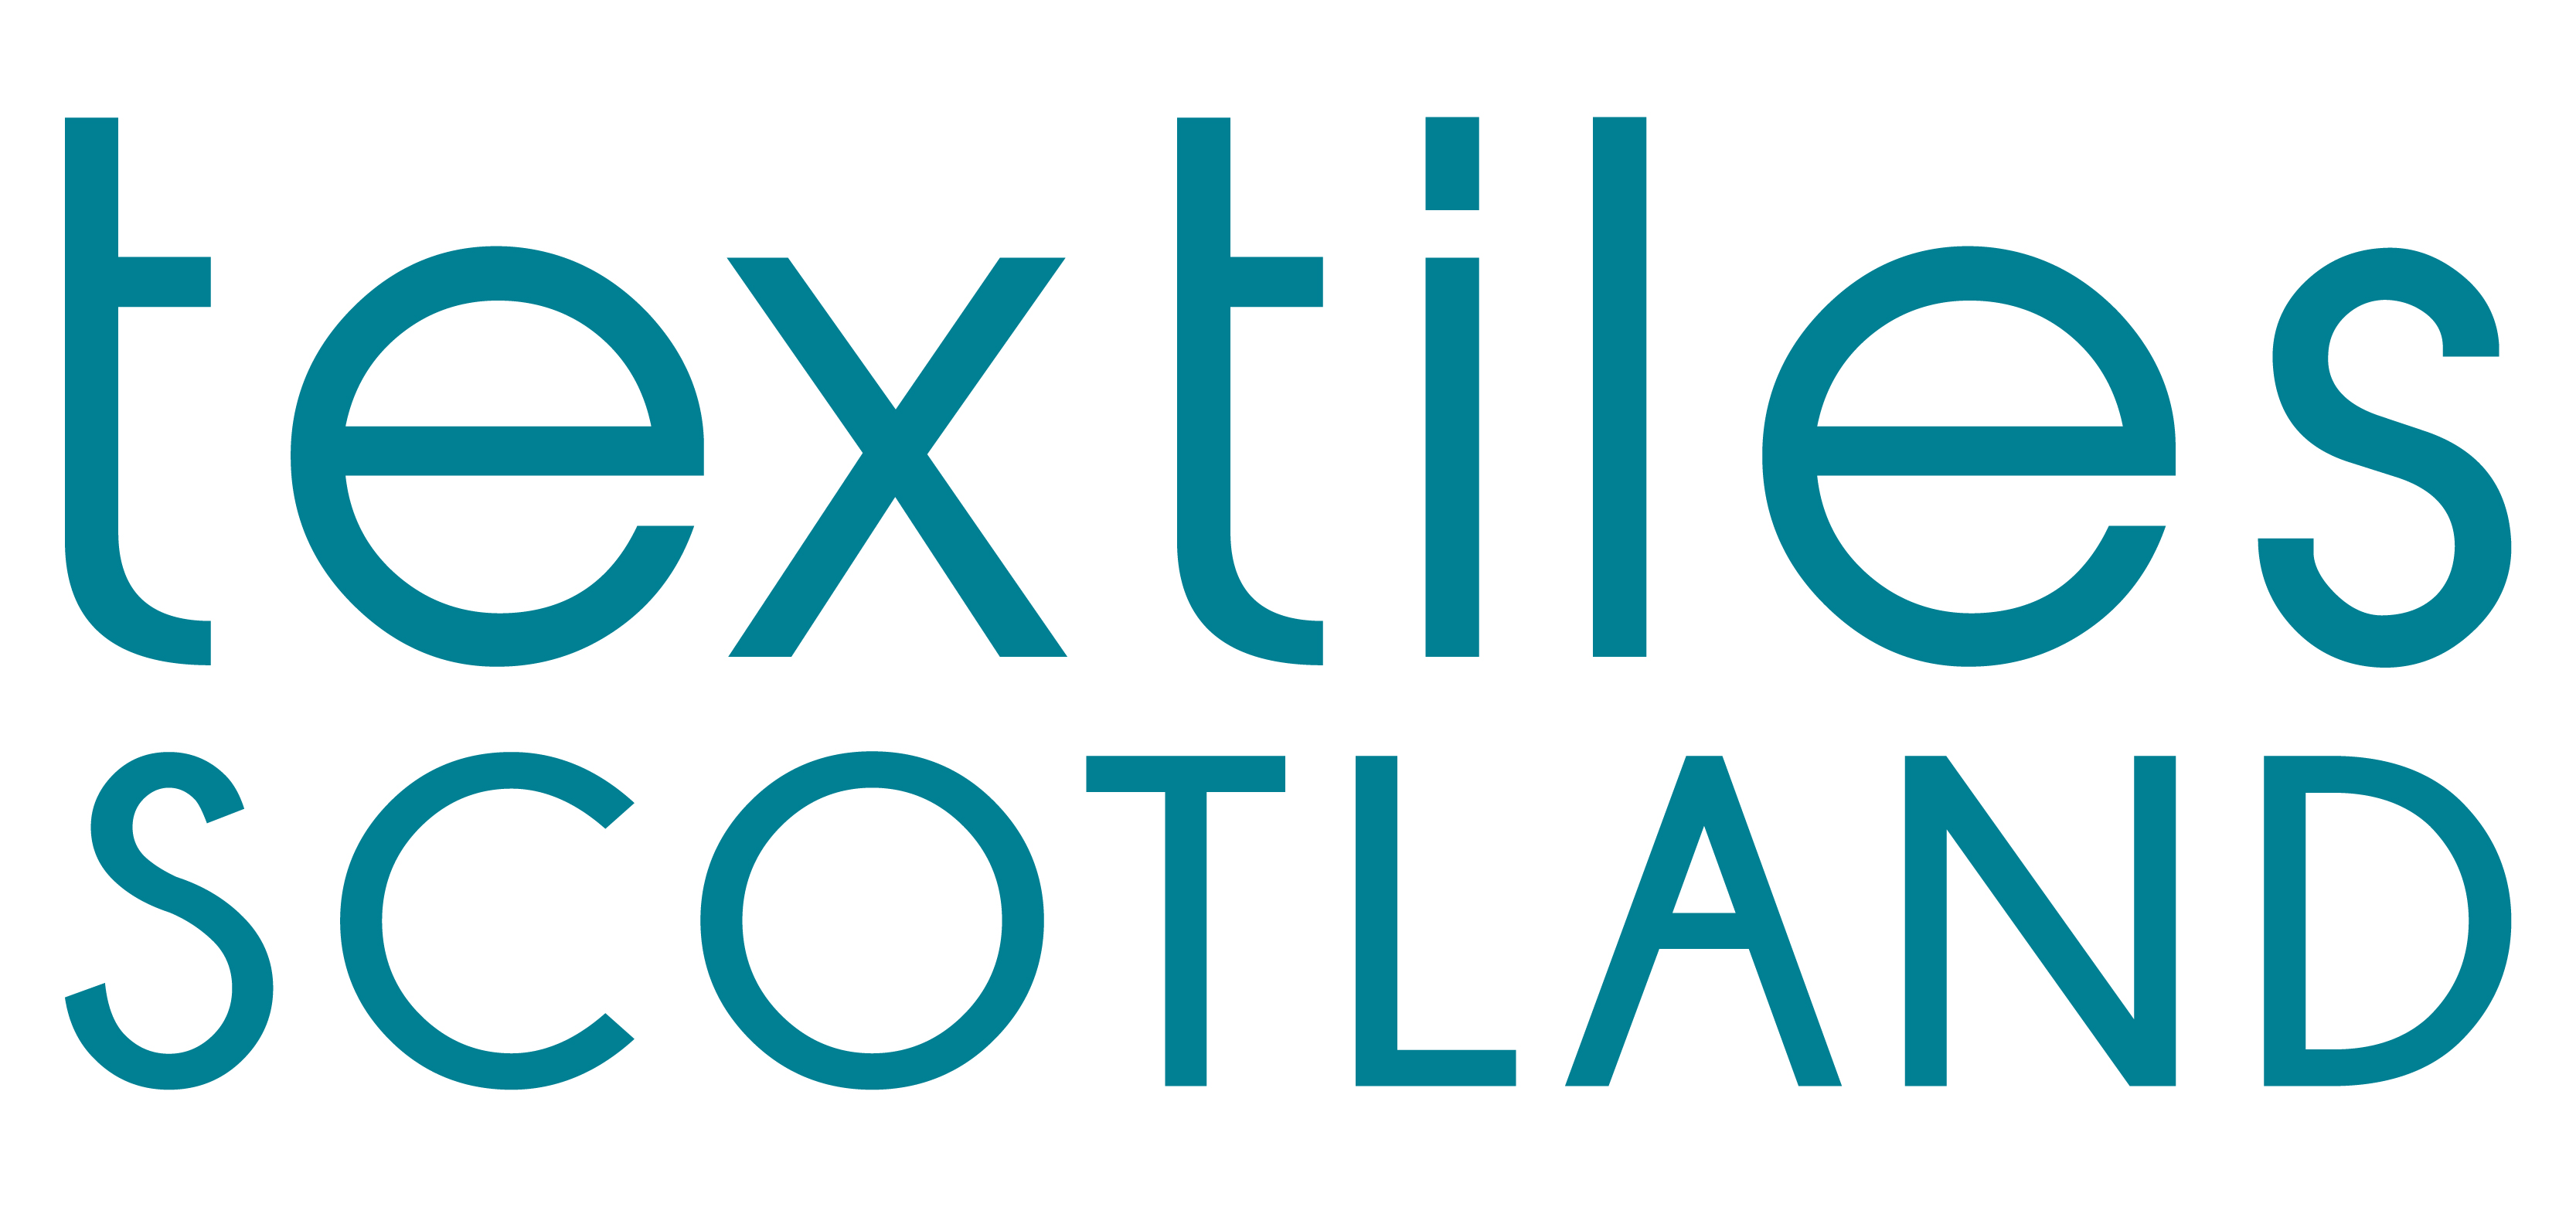 Textiles SCotland